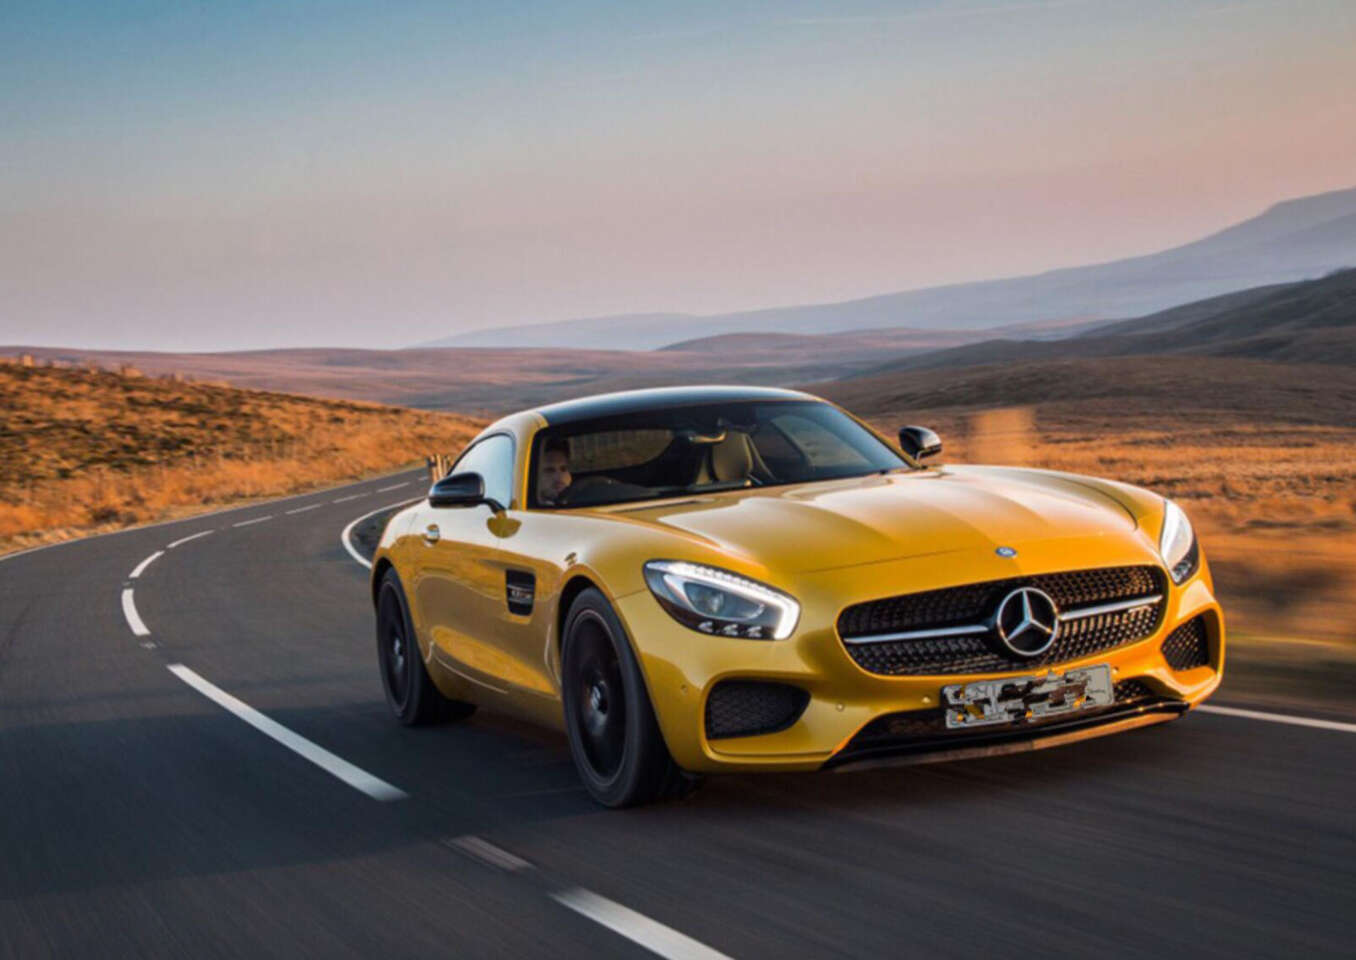 Zážitkové jazdy na najexkluzívnejších športových autách v Br...